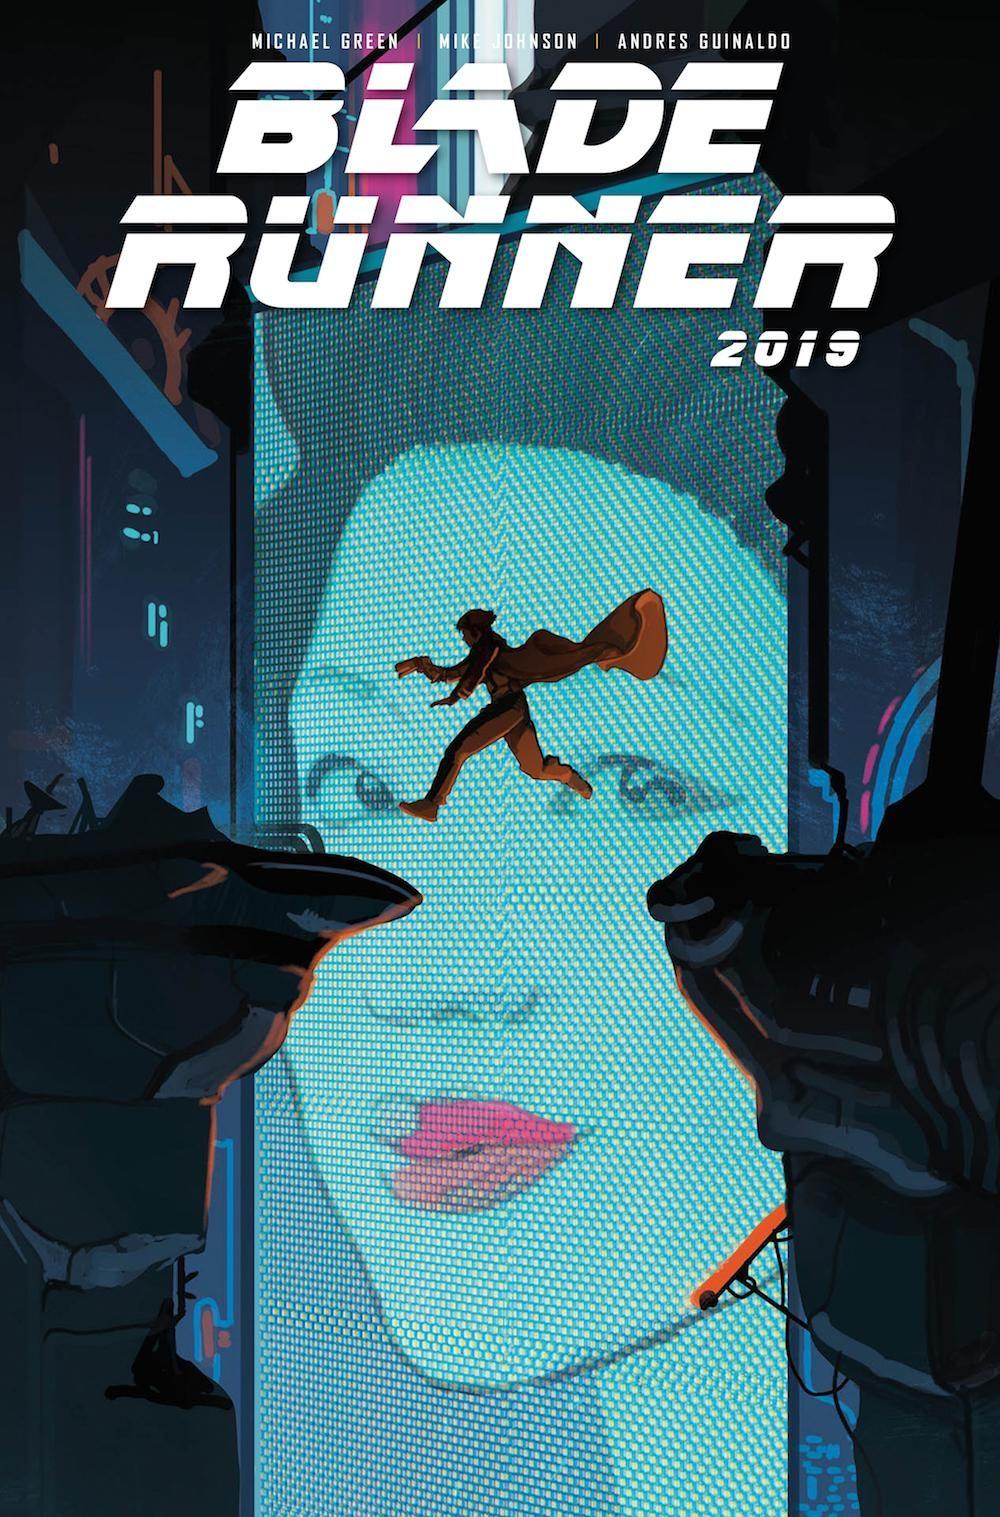 Blade Runner Issue -2 Cover (per Comixology).jpg